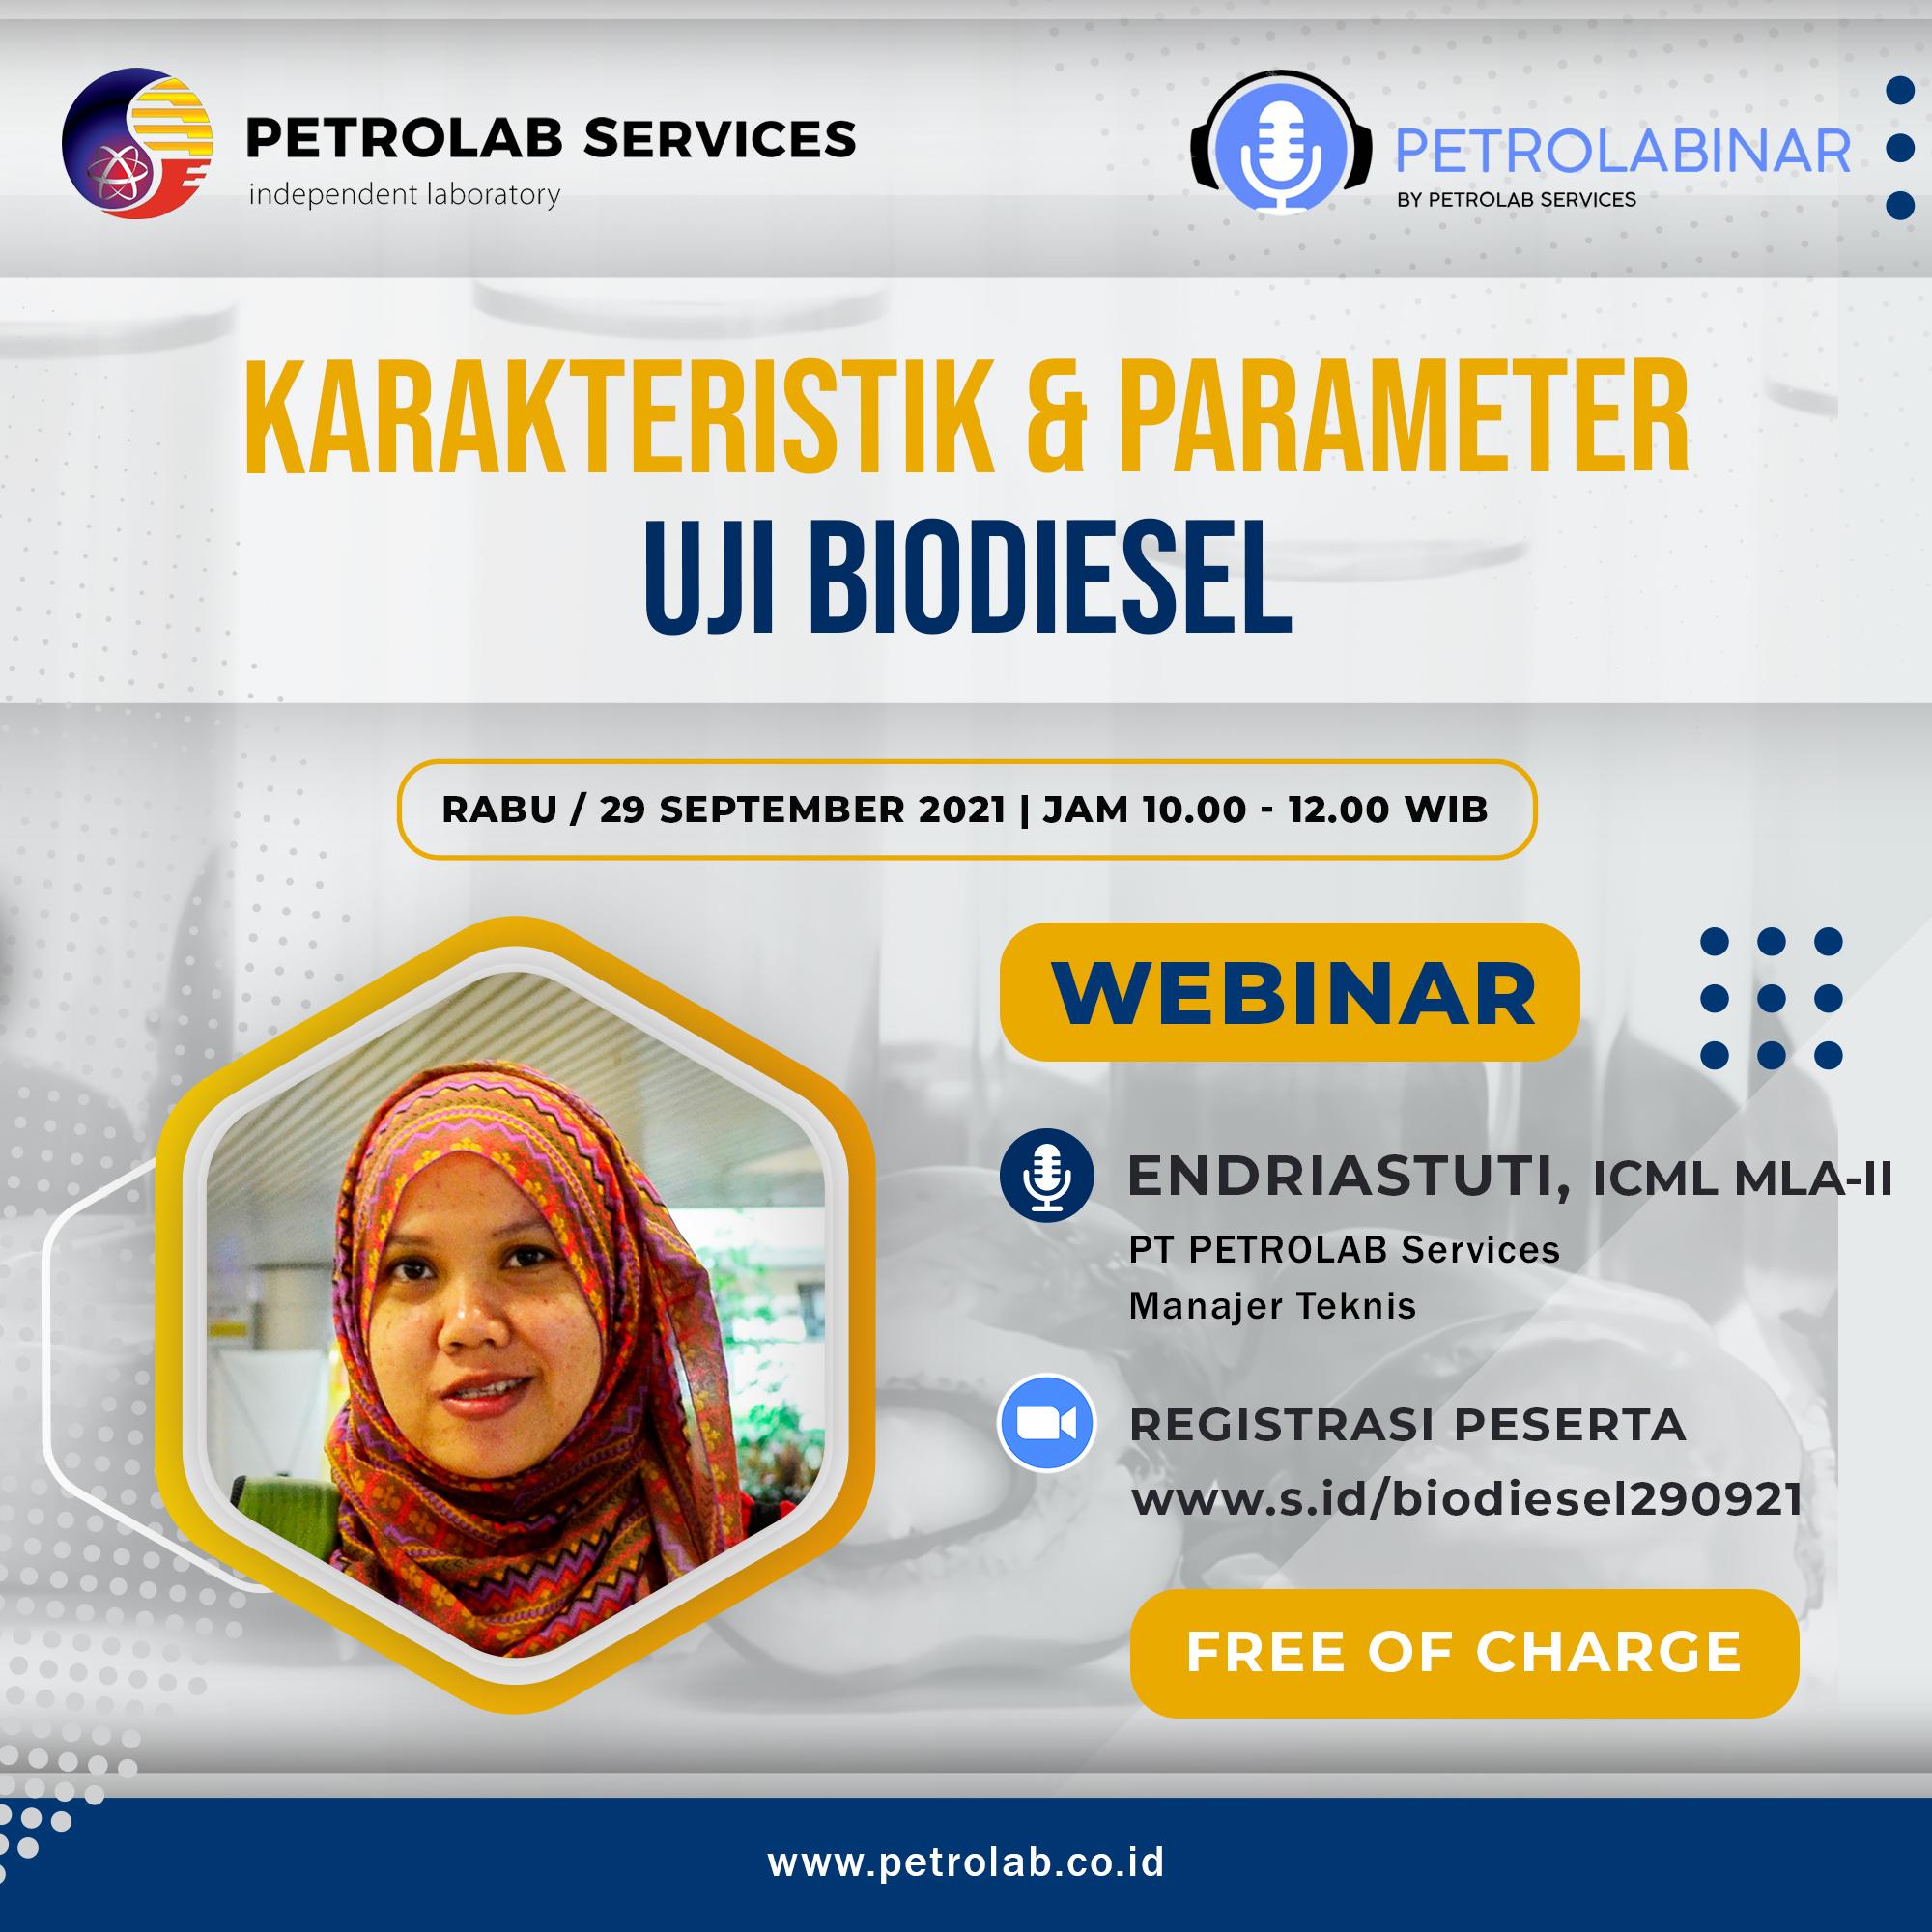 uji biodiesel